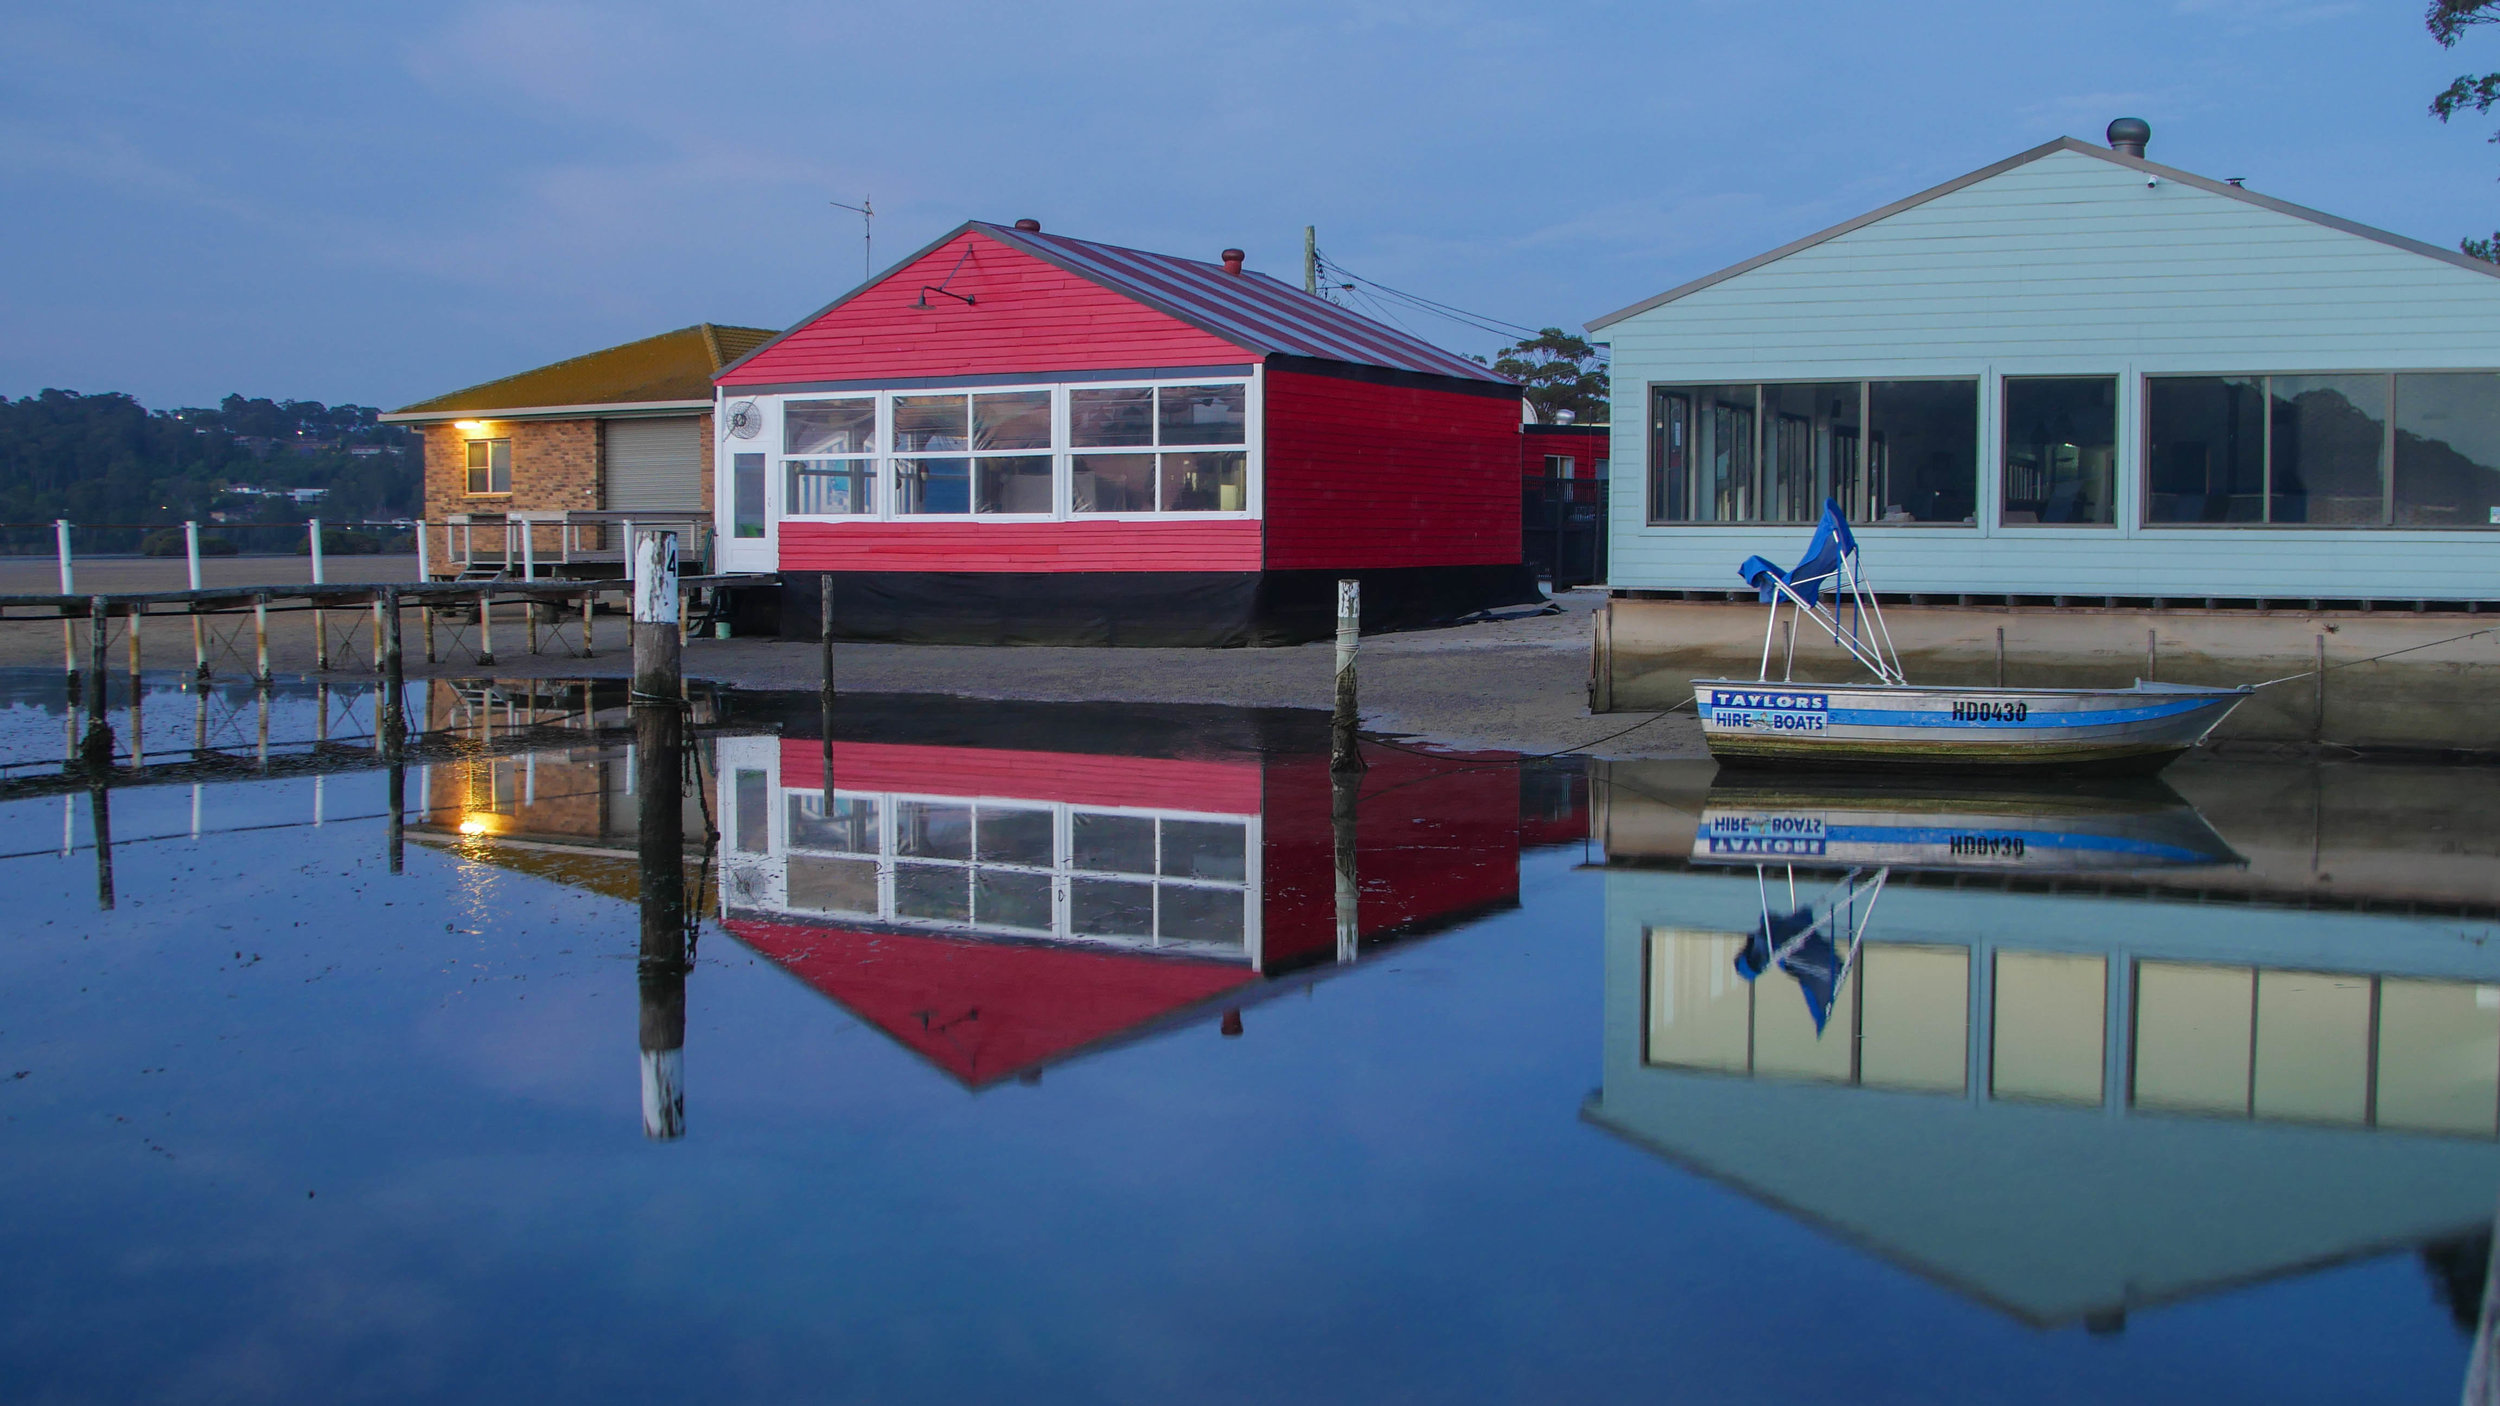 Saphire Coast NSW Travel Australia Vanlife (11 of 11).jpg